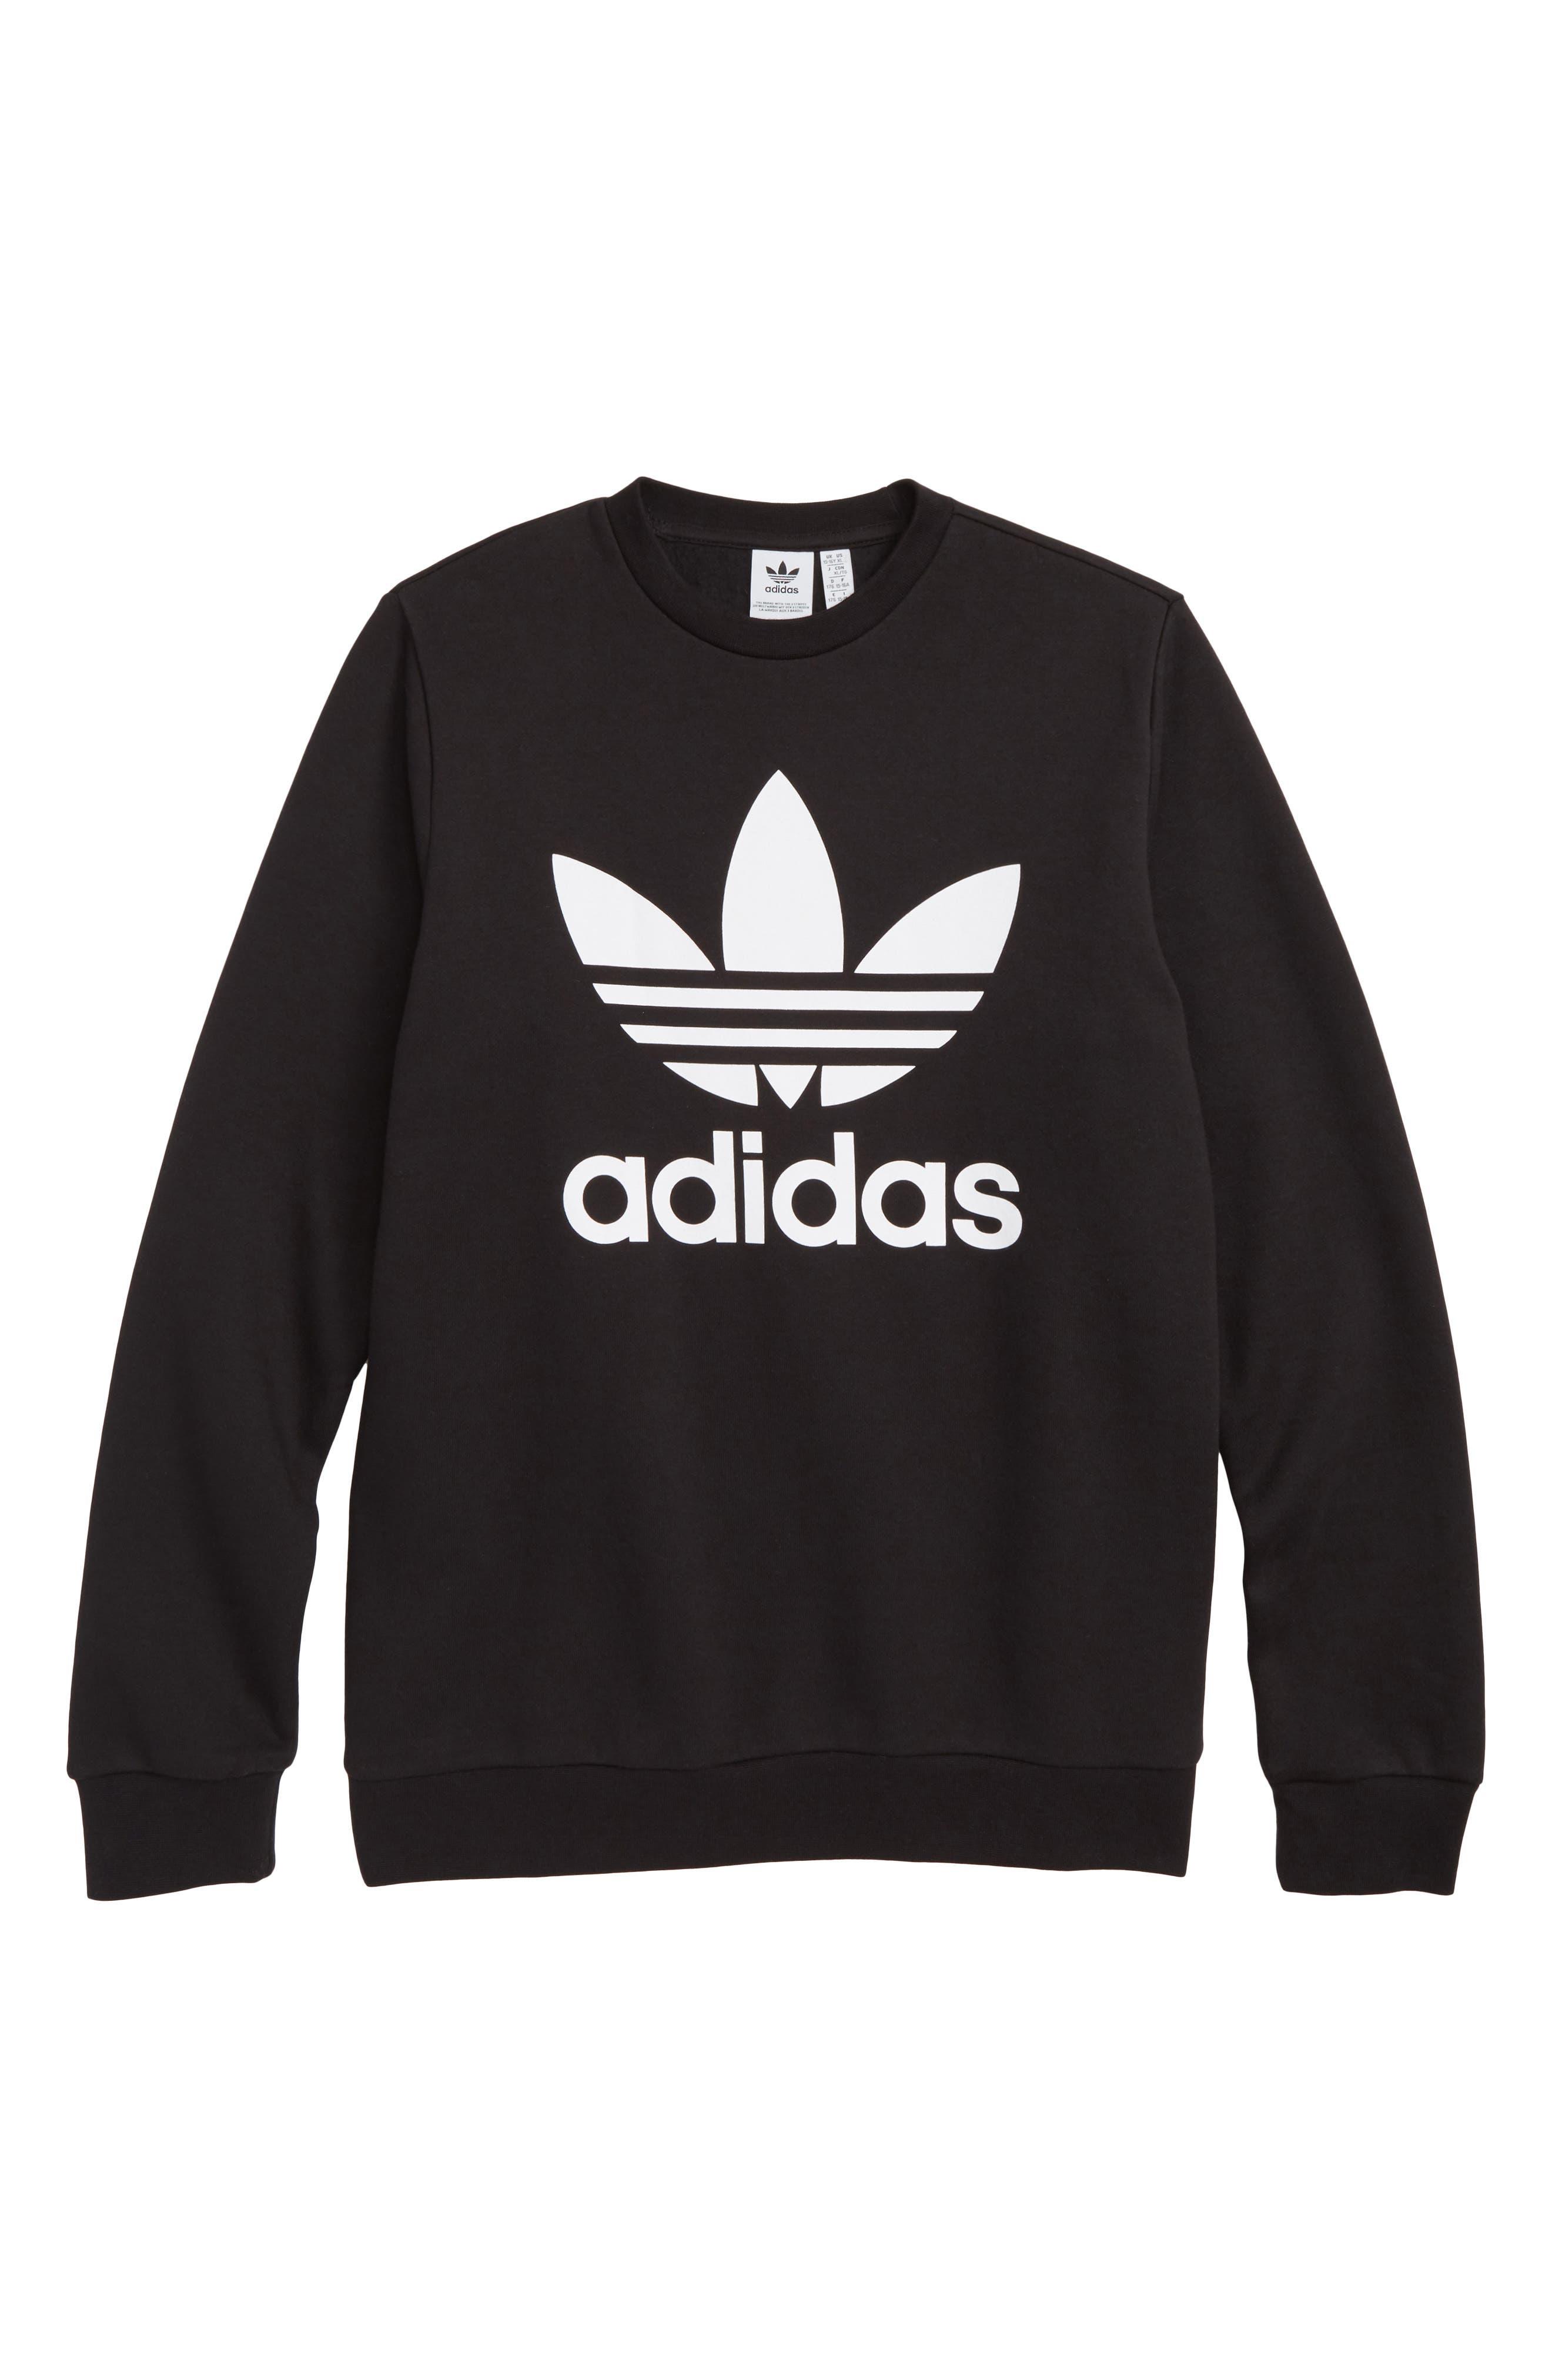 adidas Trefoil Logo Sweatshirt,                             Main thumbnail 1, color,                             BLACK / WHITE